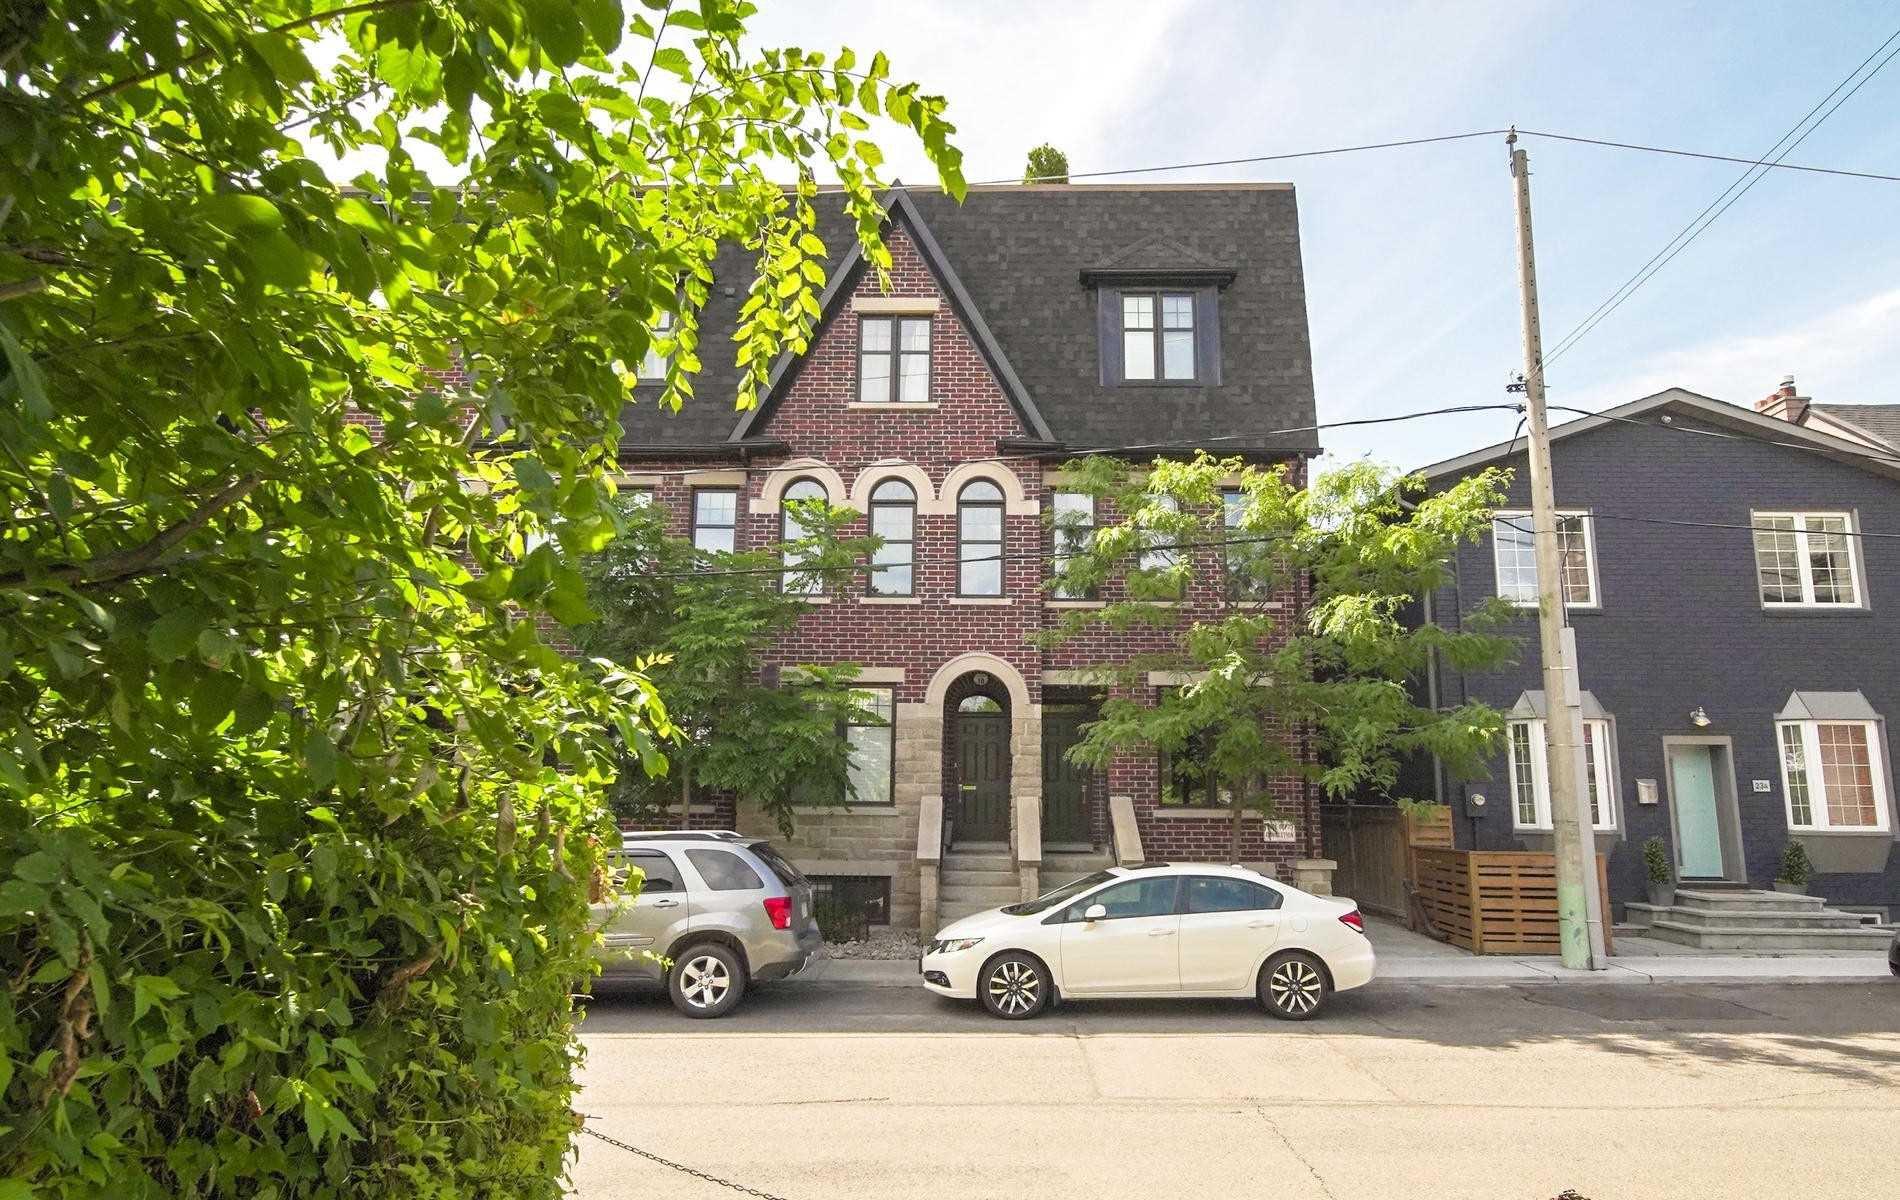 Photo 16: Photos: Th 11 150 Broadview Avenue in Toronto: South Riverdale Condo for sale (Toronto E01)  : MLS®# E4519038